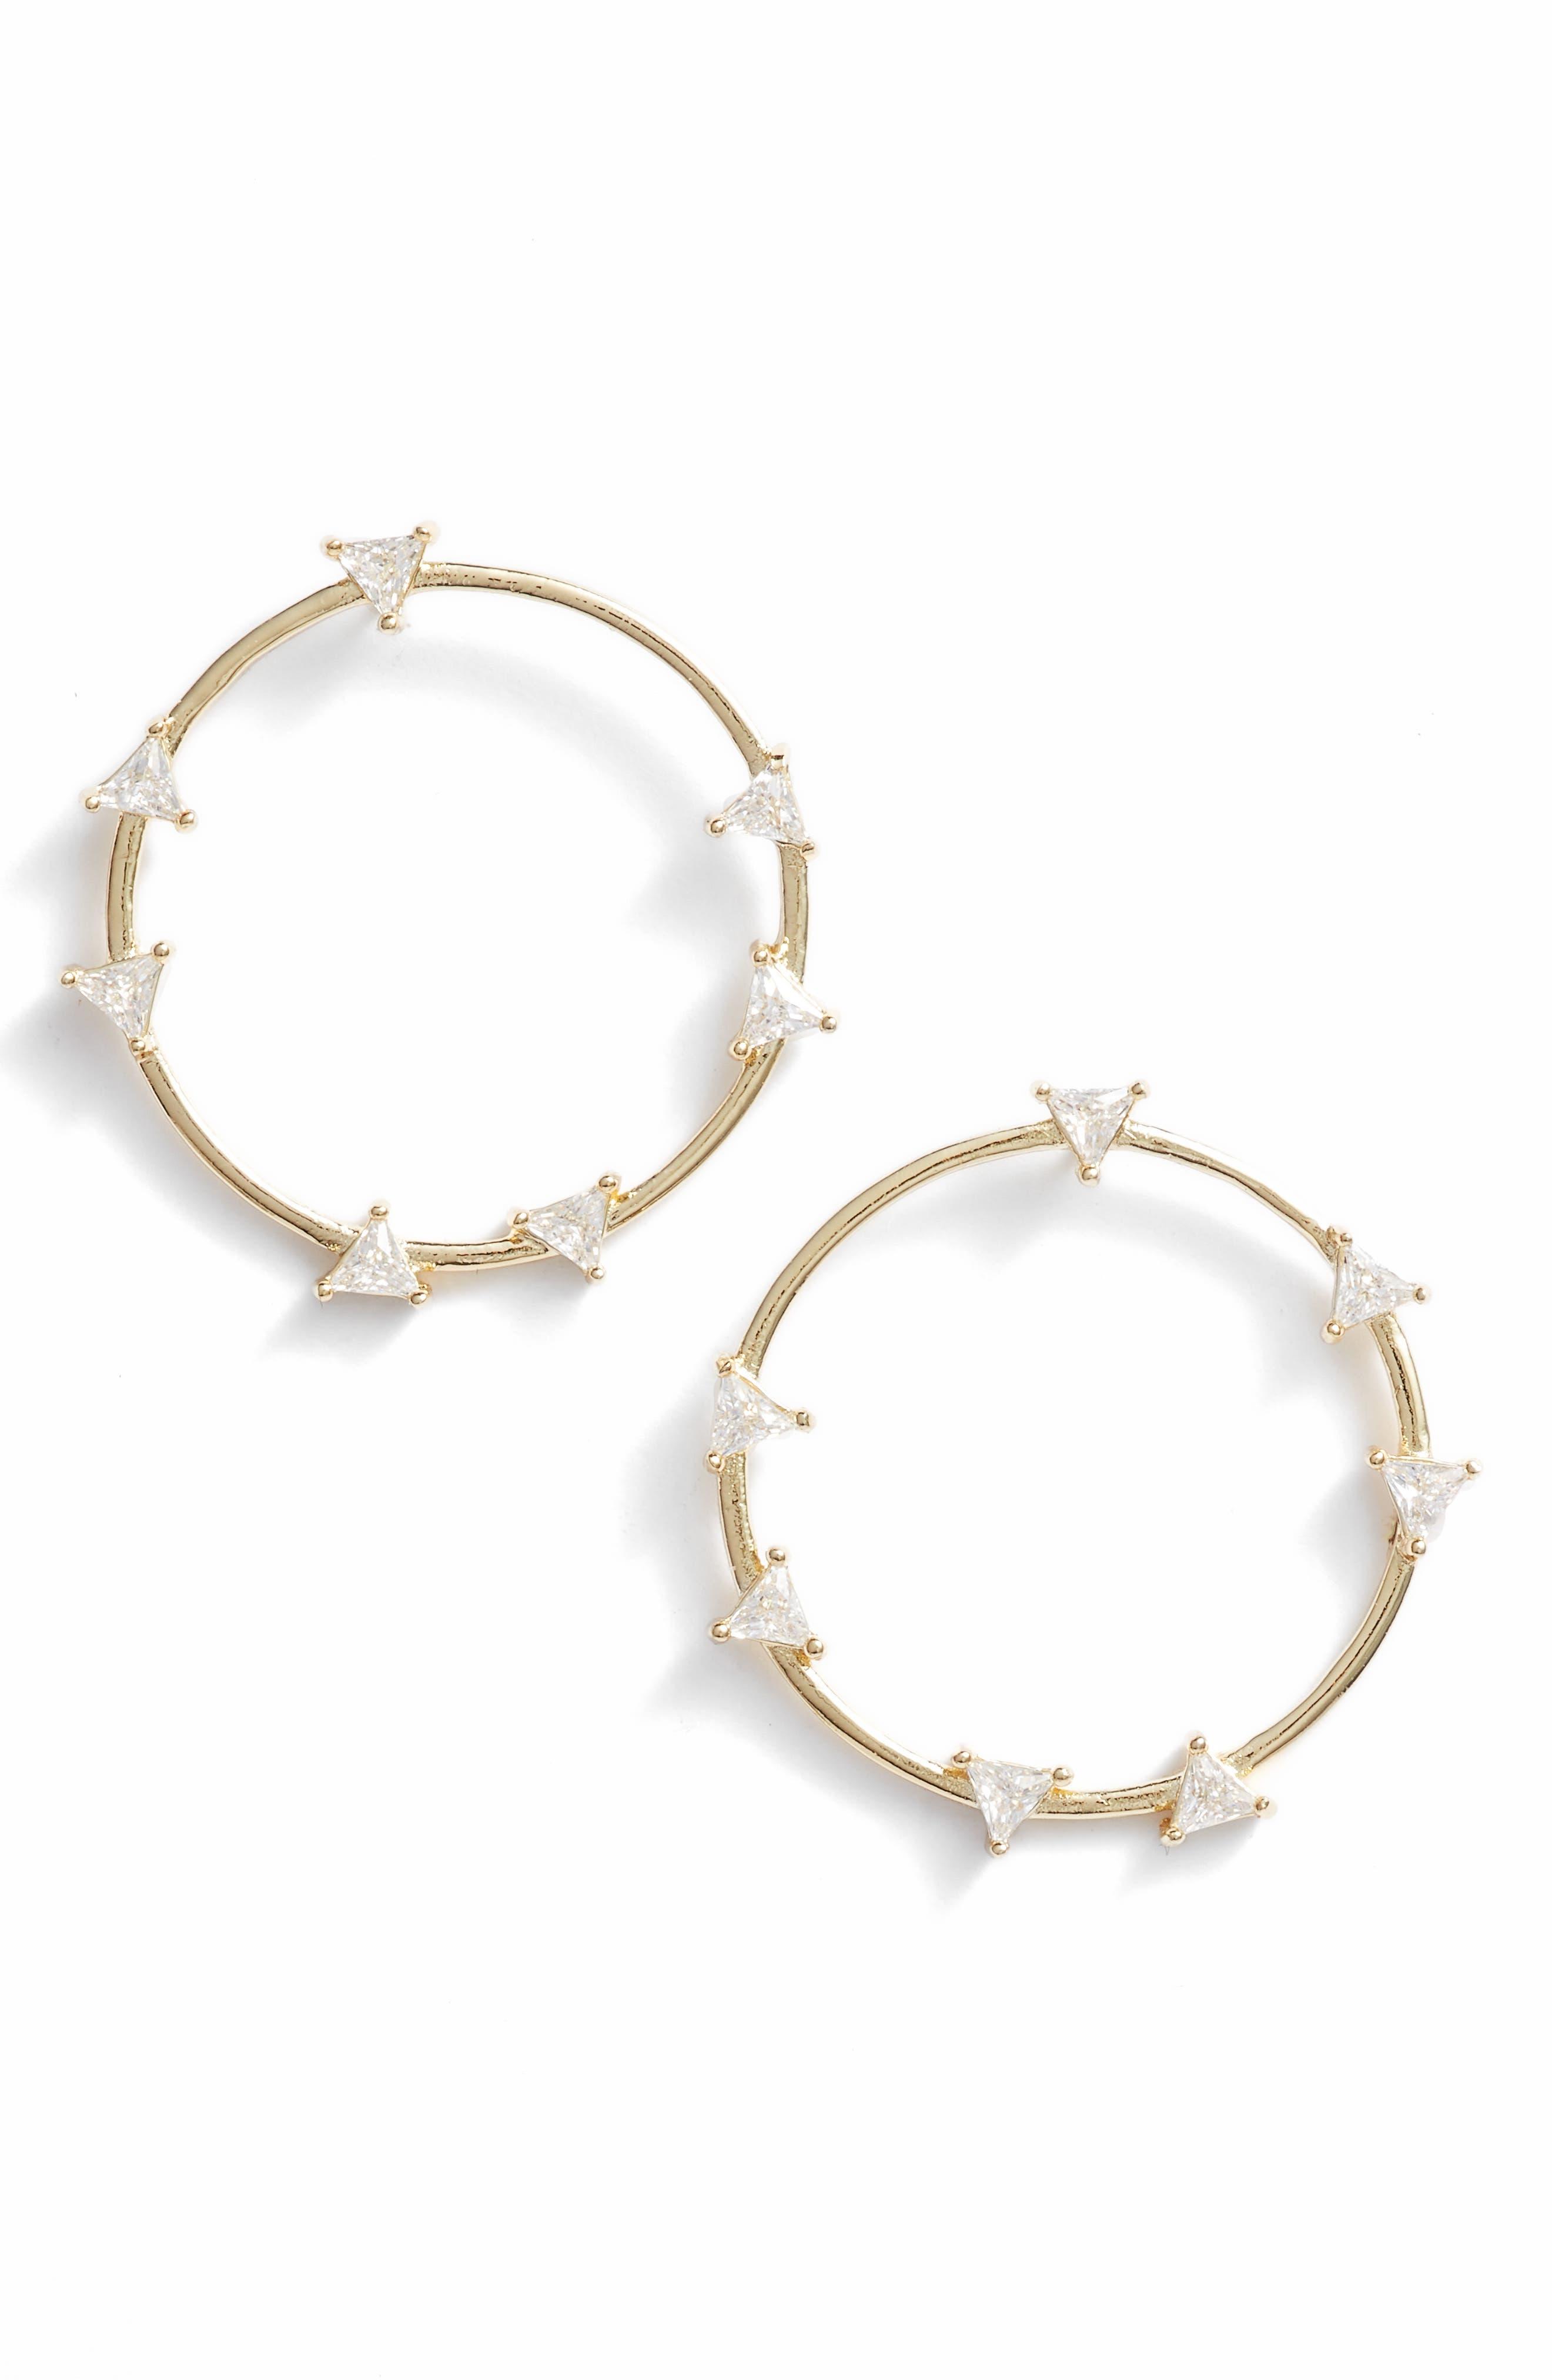 MELINDA MARIA Circle Earrings in Clear/ Gold